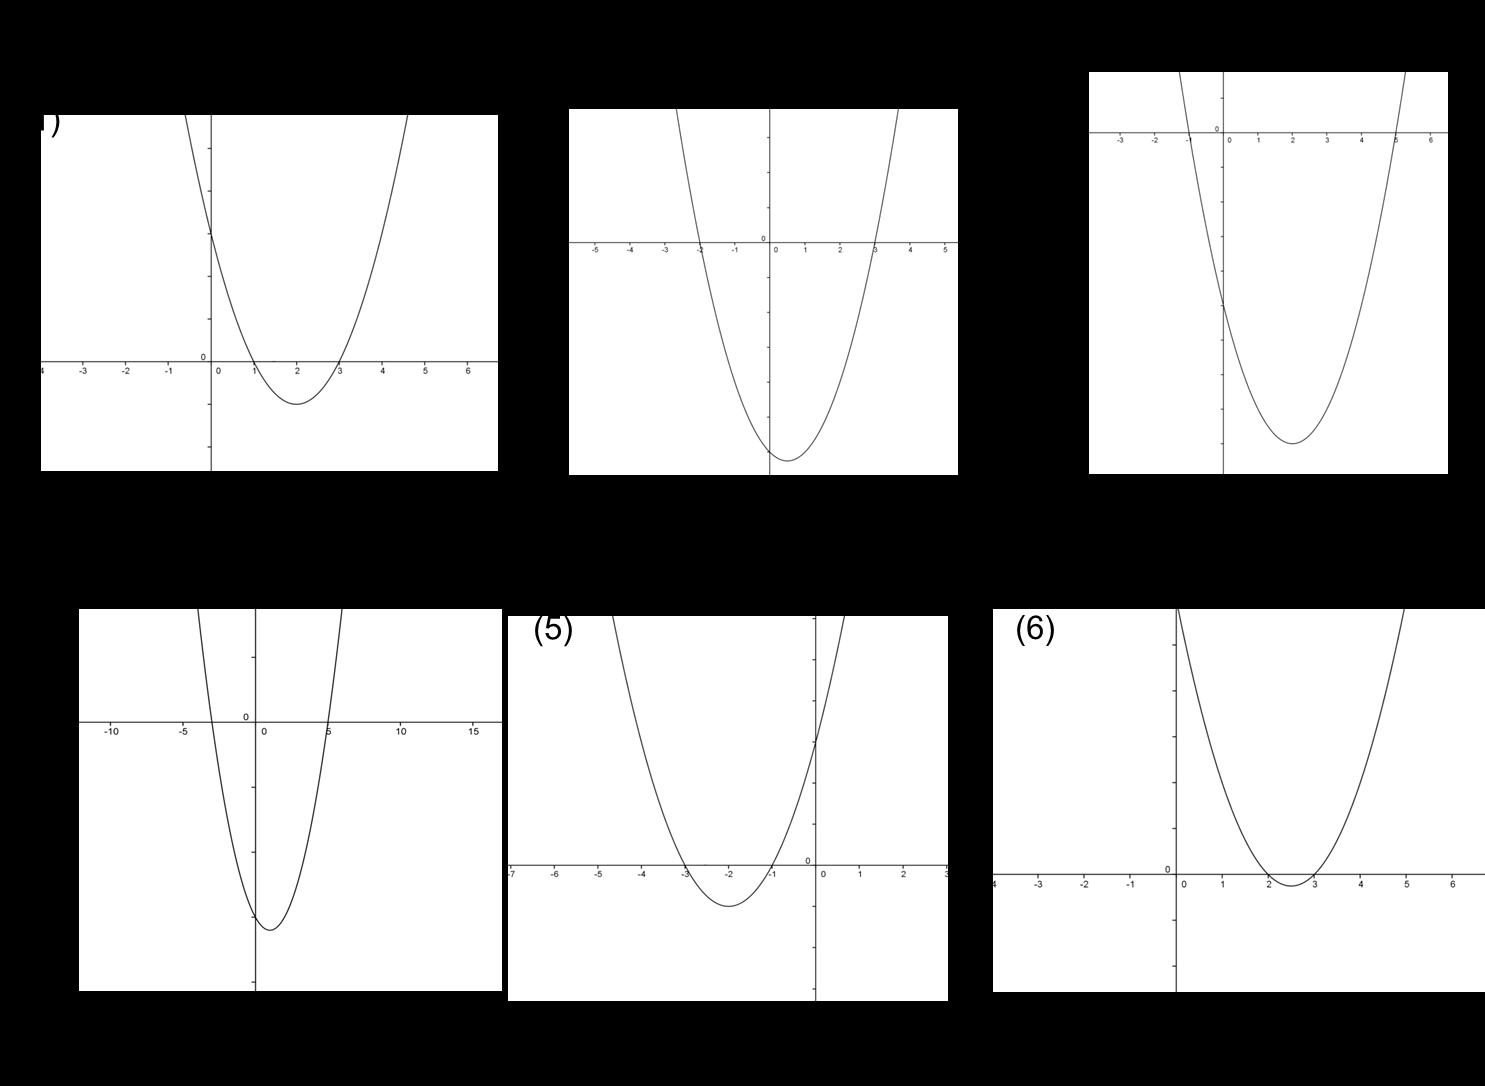 median don steward mathematics teaching  which graph